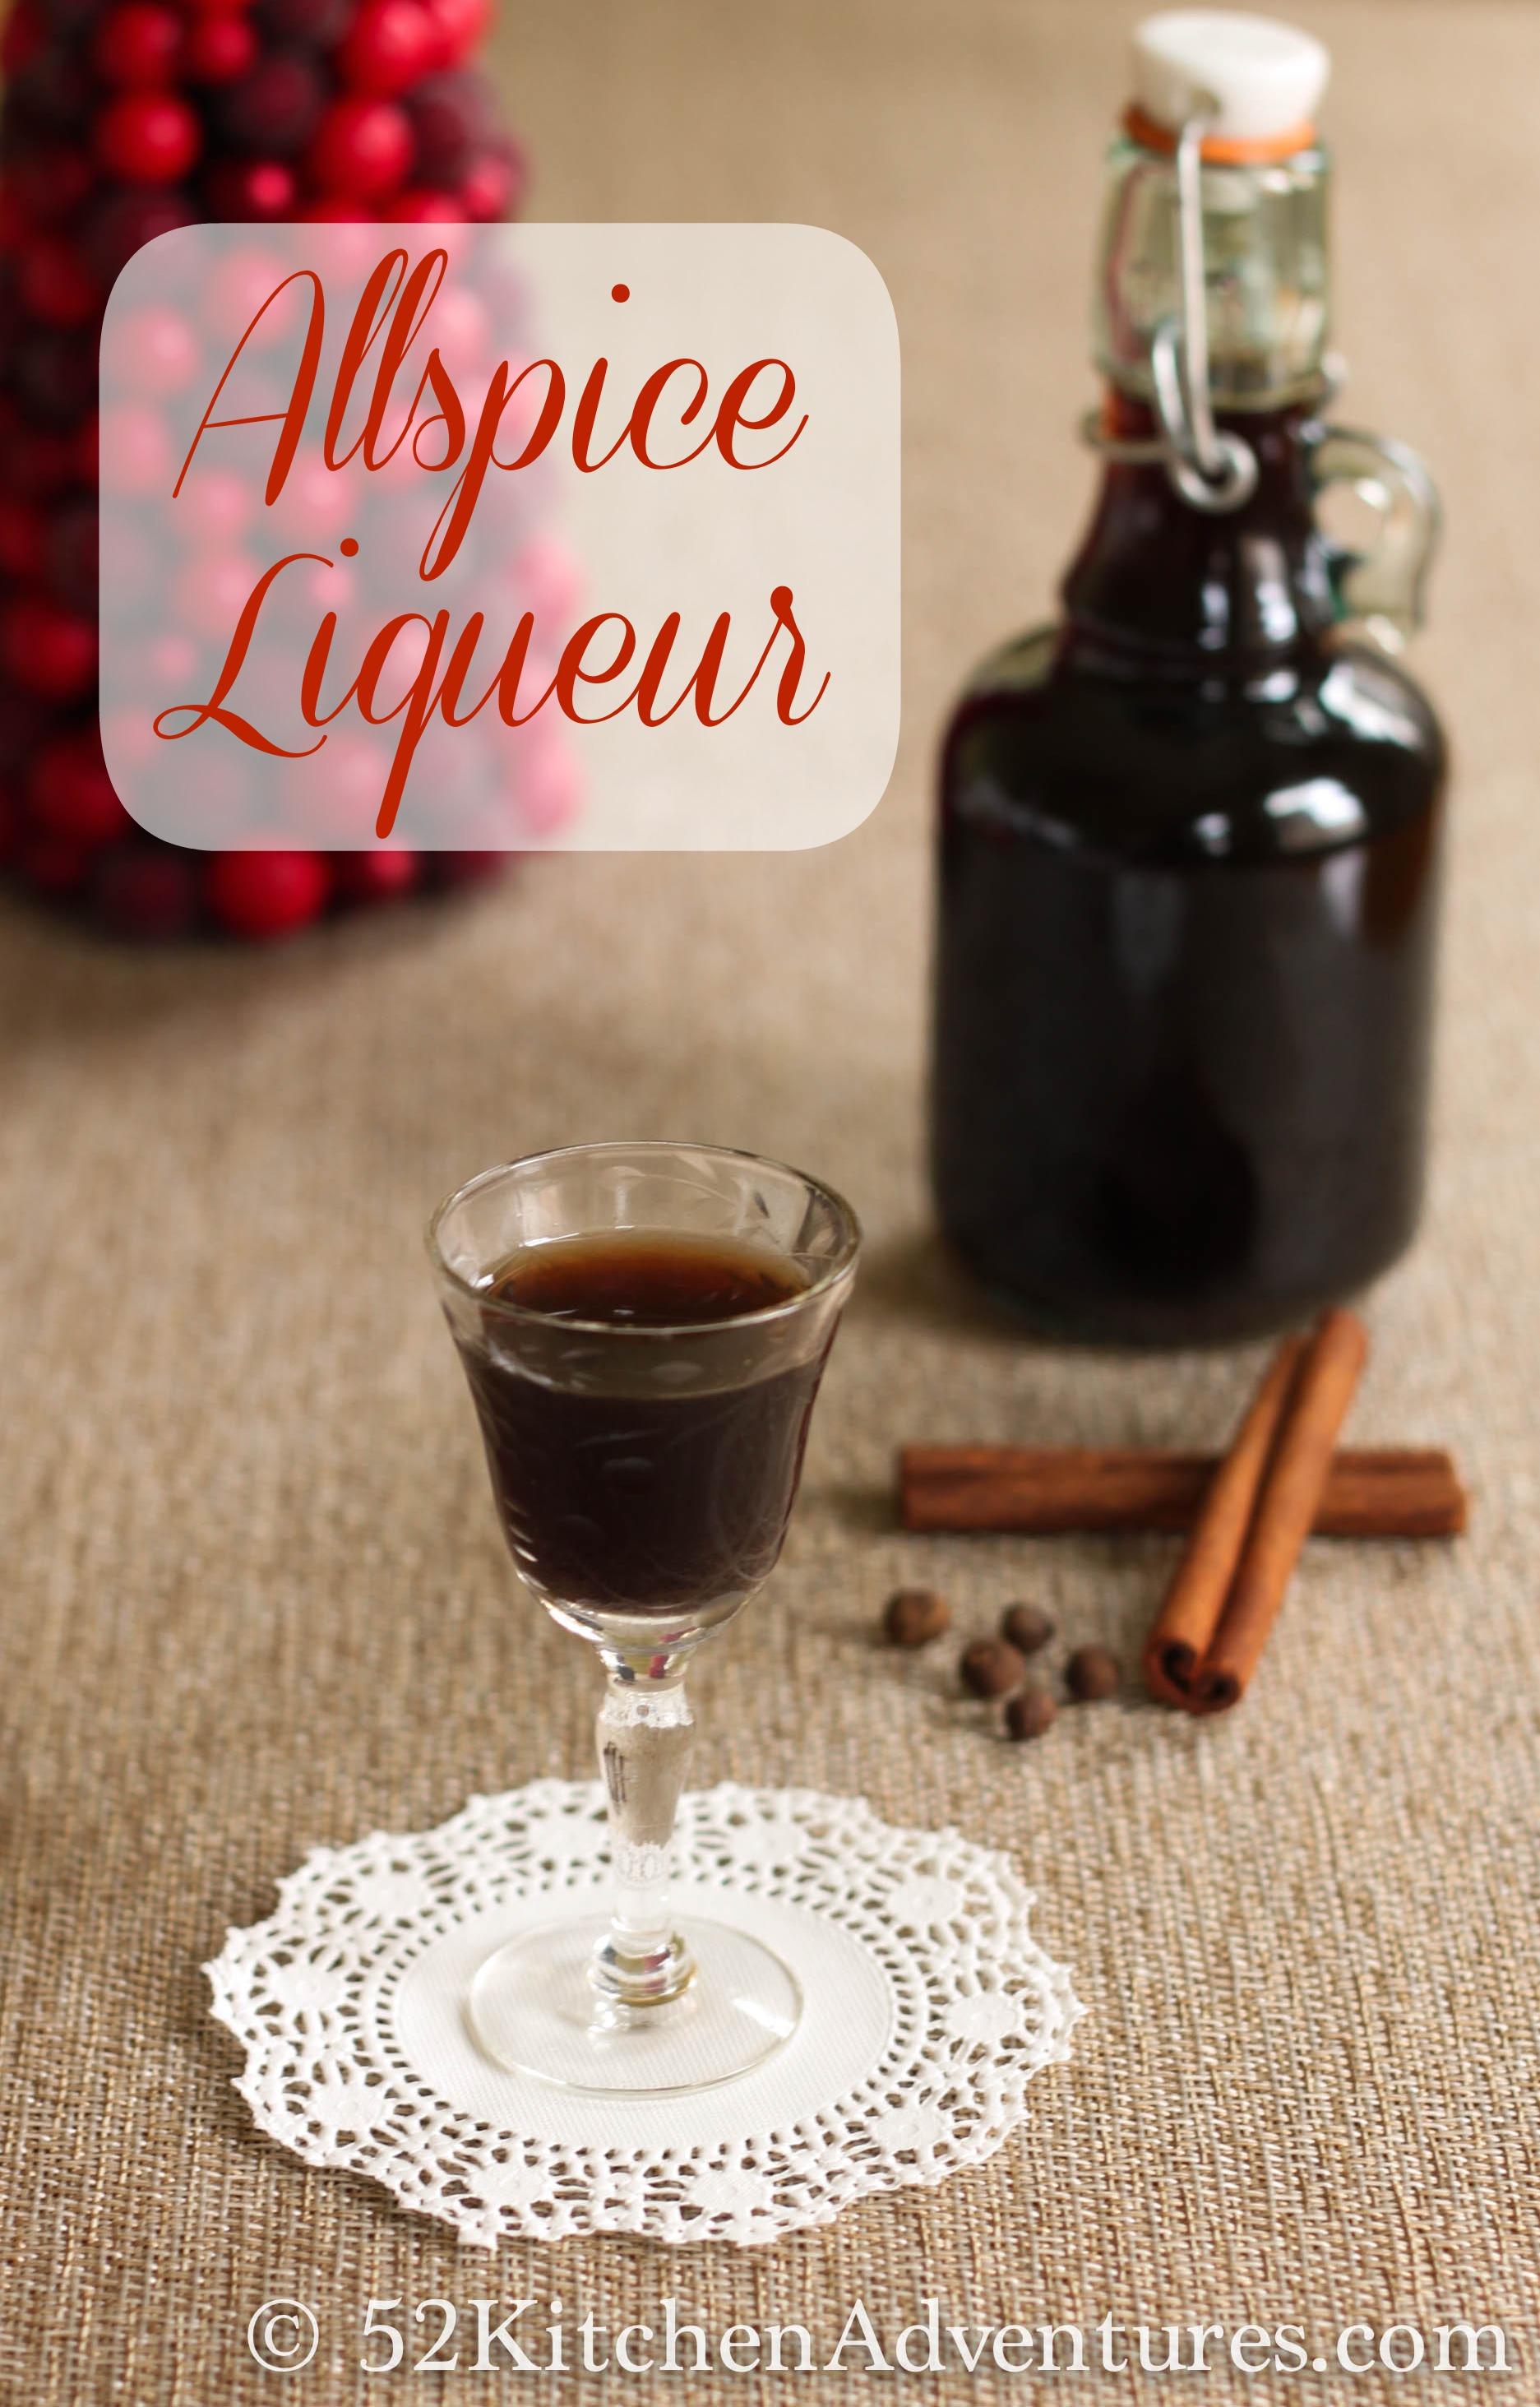 Allspice liqueur